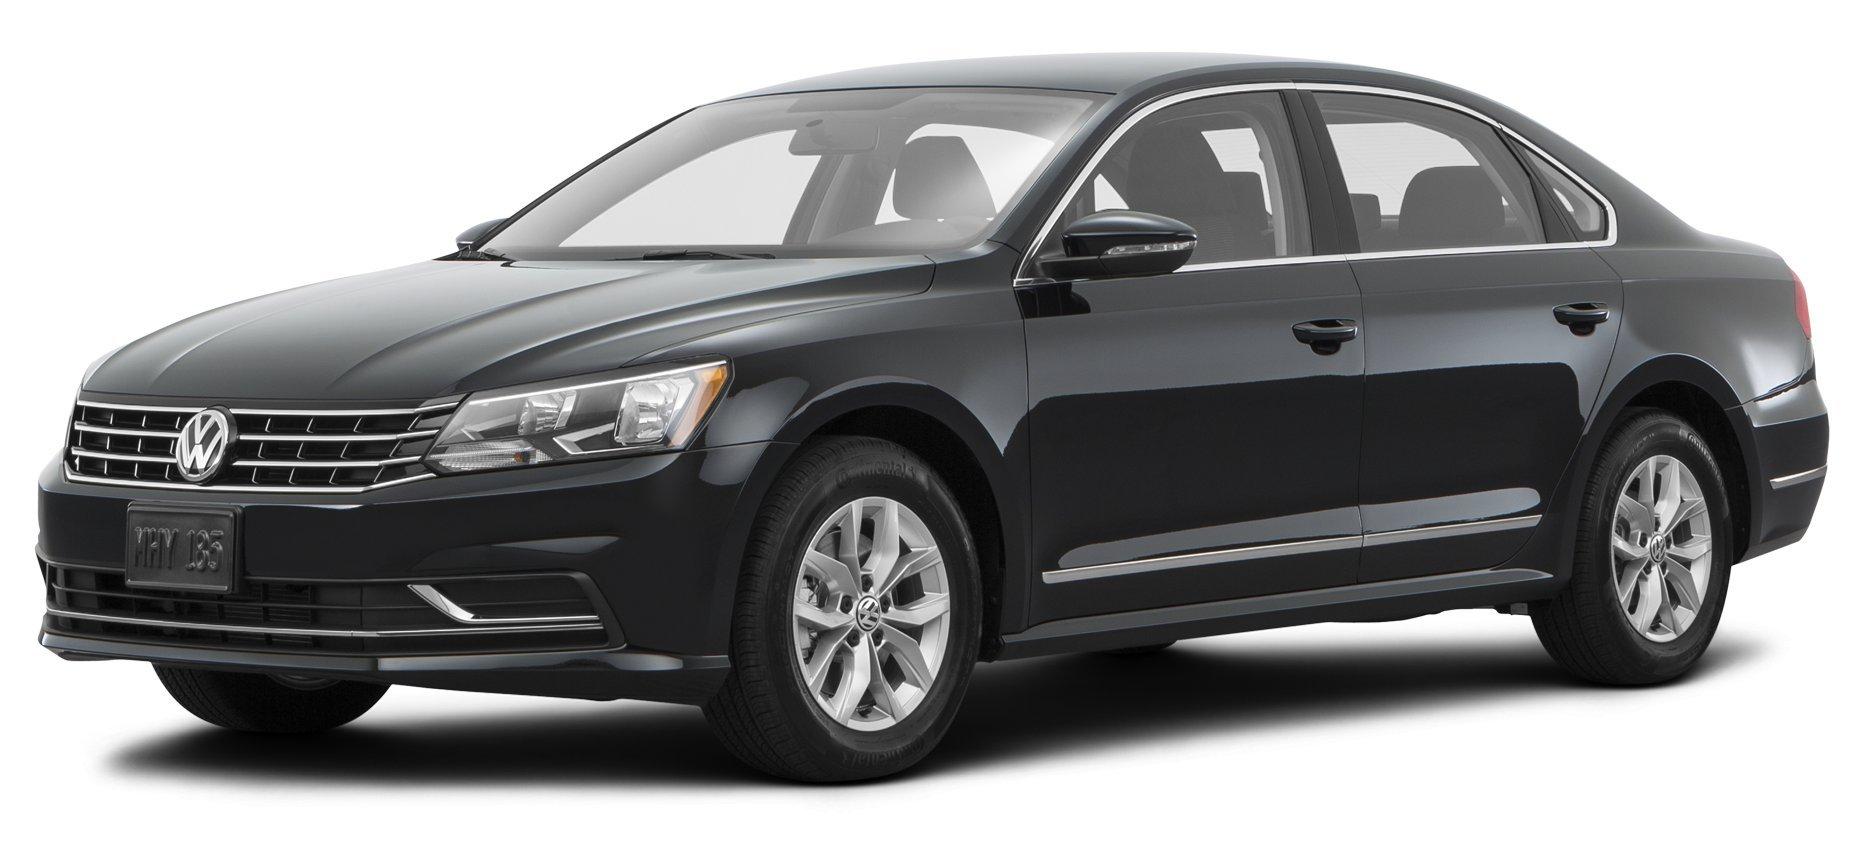 Amazon 2016 nissan altima reviews images and specs vehicles 2016 volkswagen passat 18t s 4 door sedan automatic transmission vanachro Images